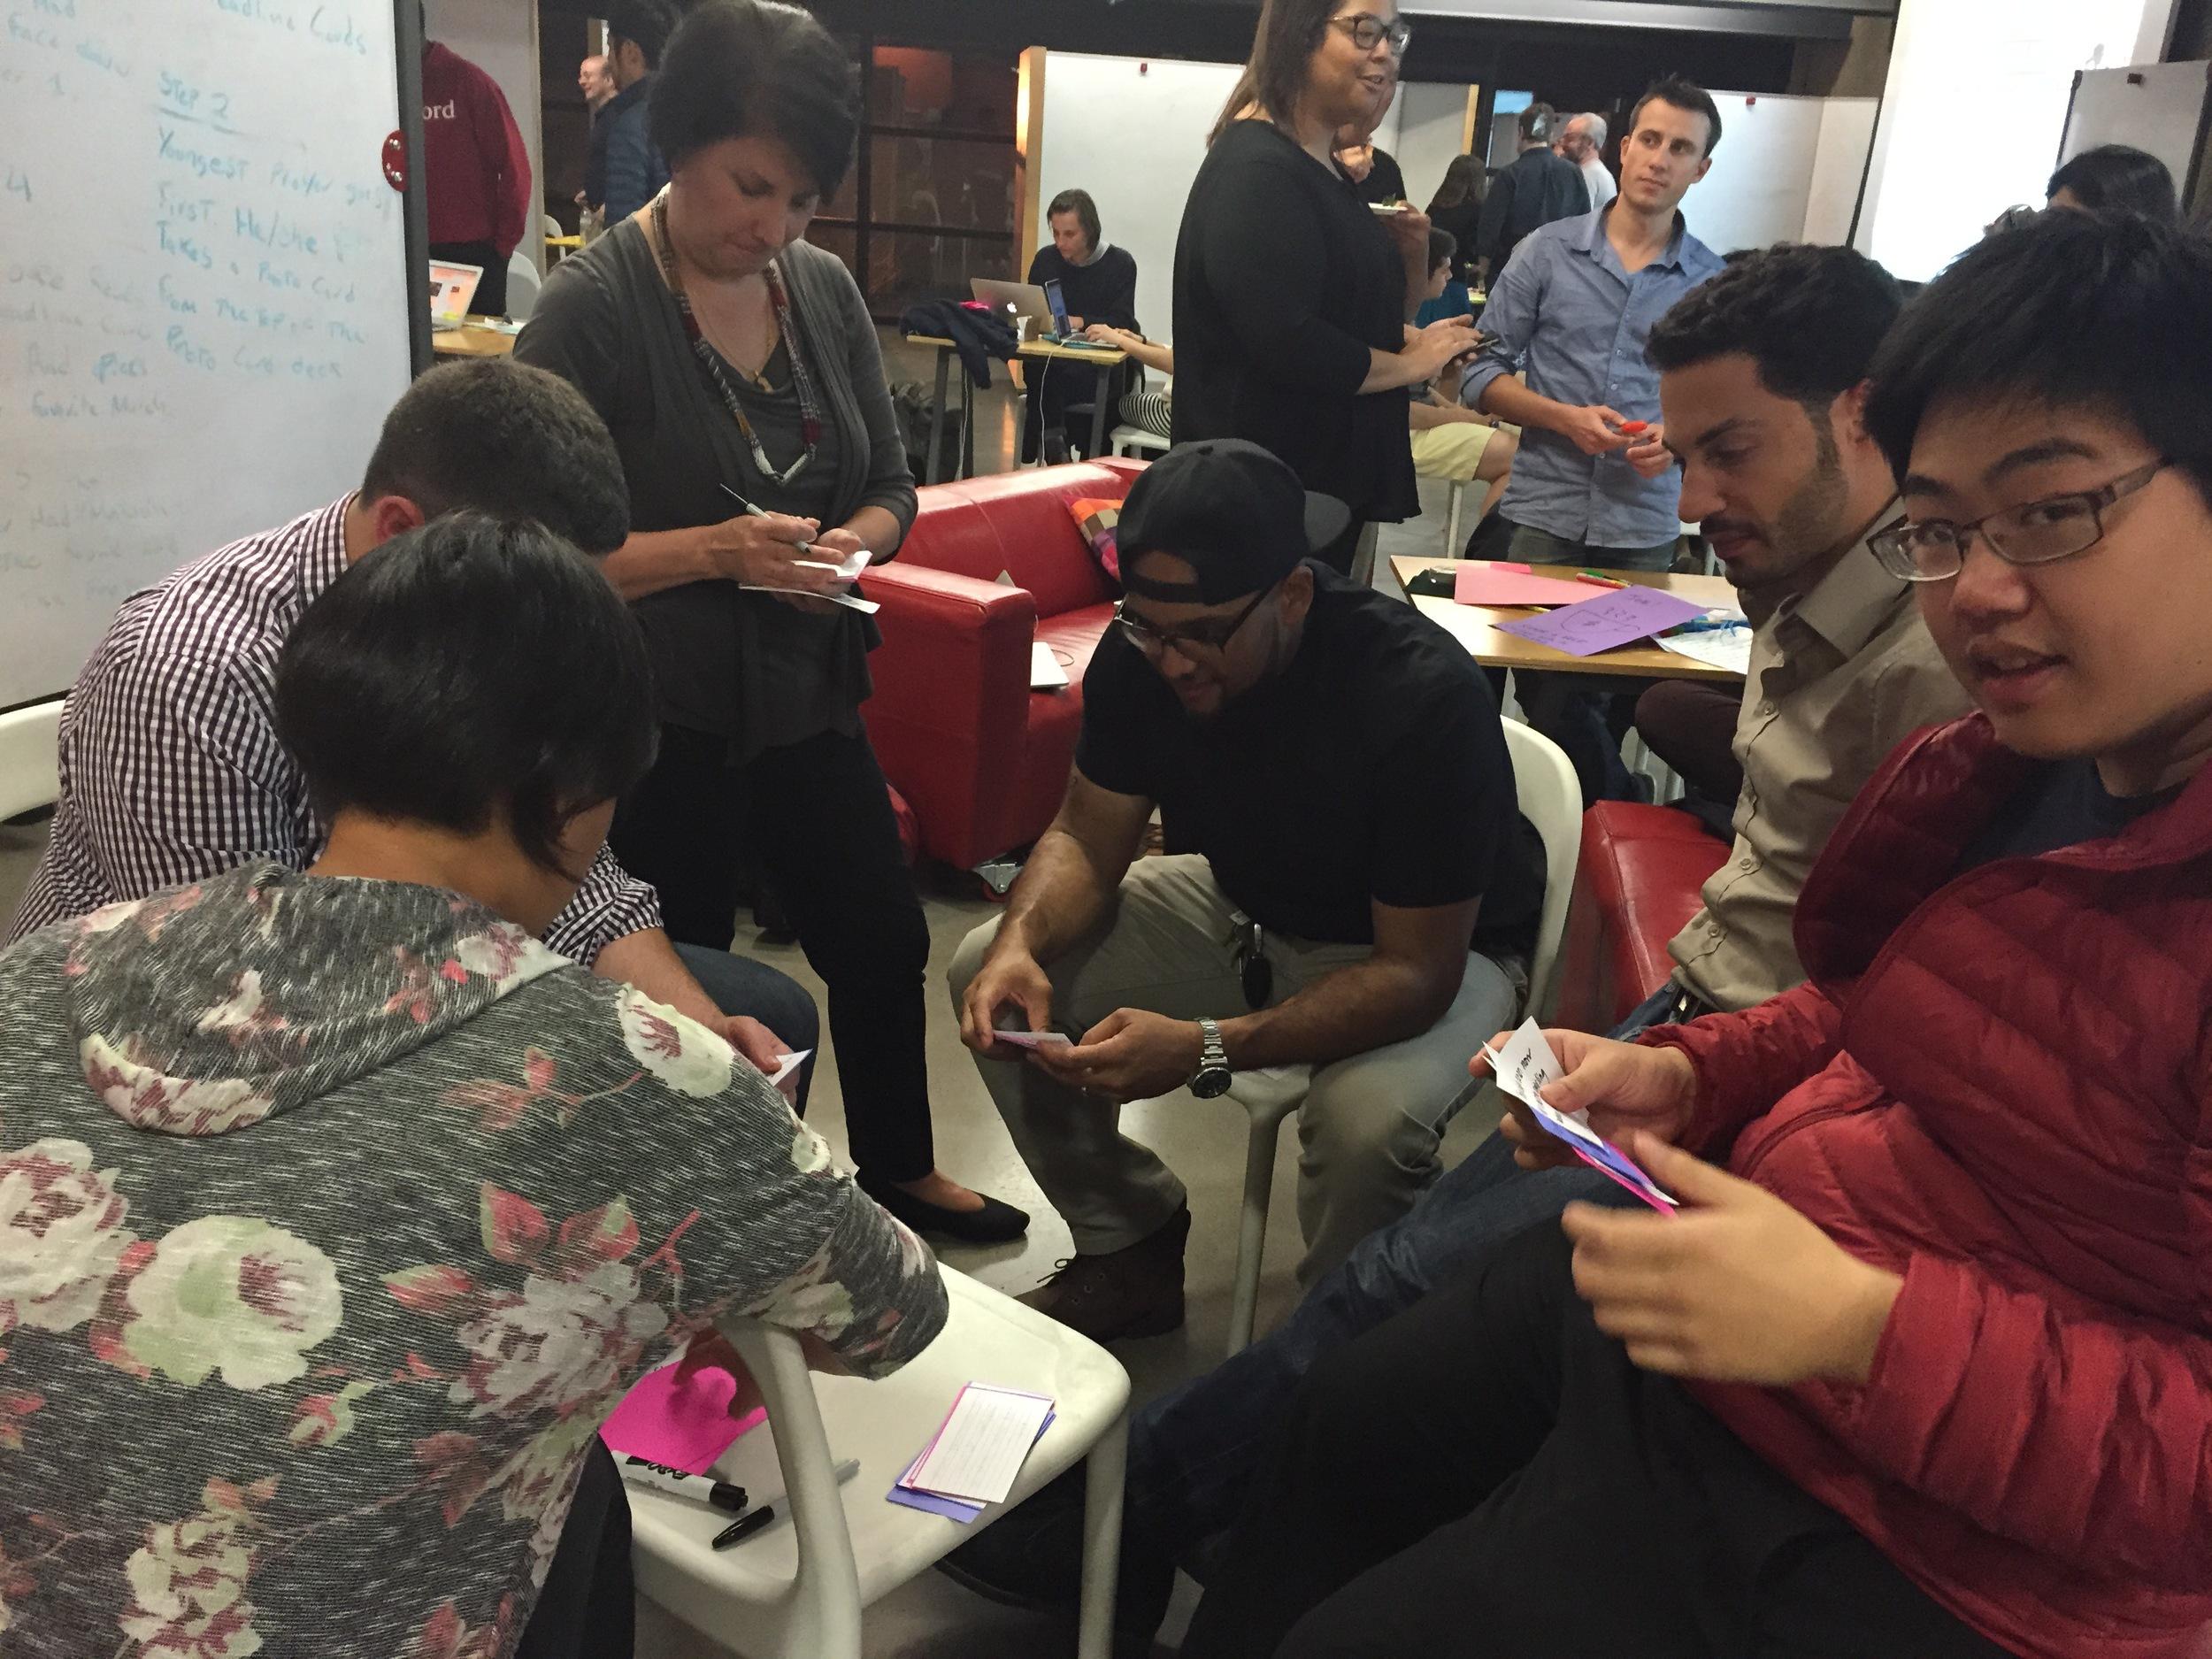 Students test their prototypes with d.school fellow, designer and Stanford Sloan Fellow alum Jason Mayden (center). (Emi Kolawole)